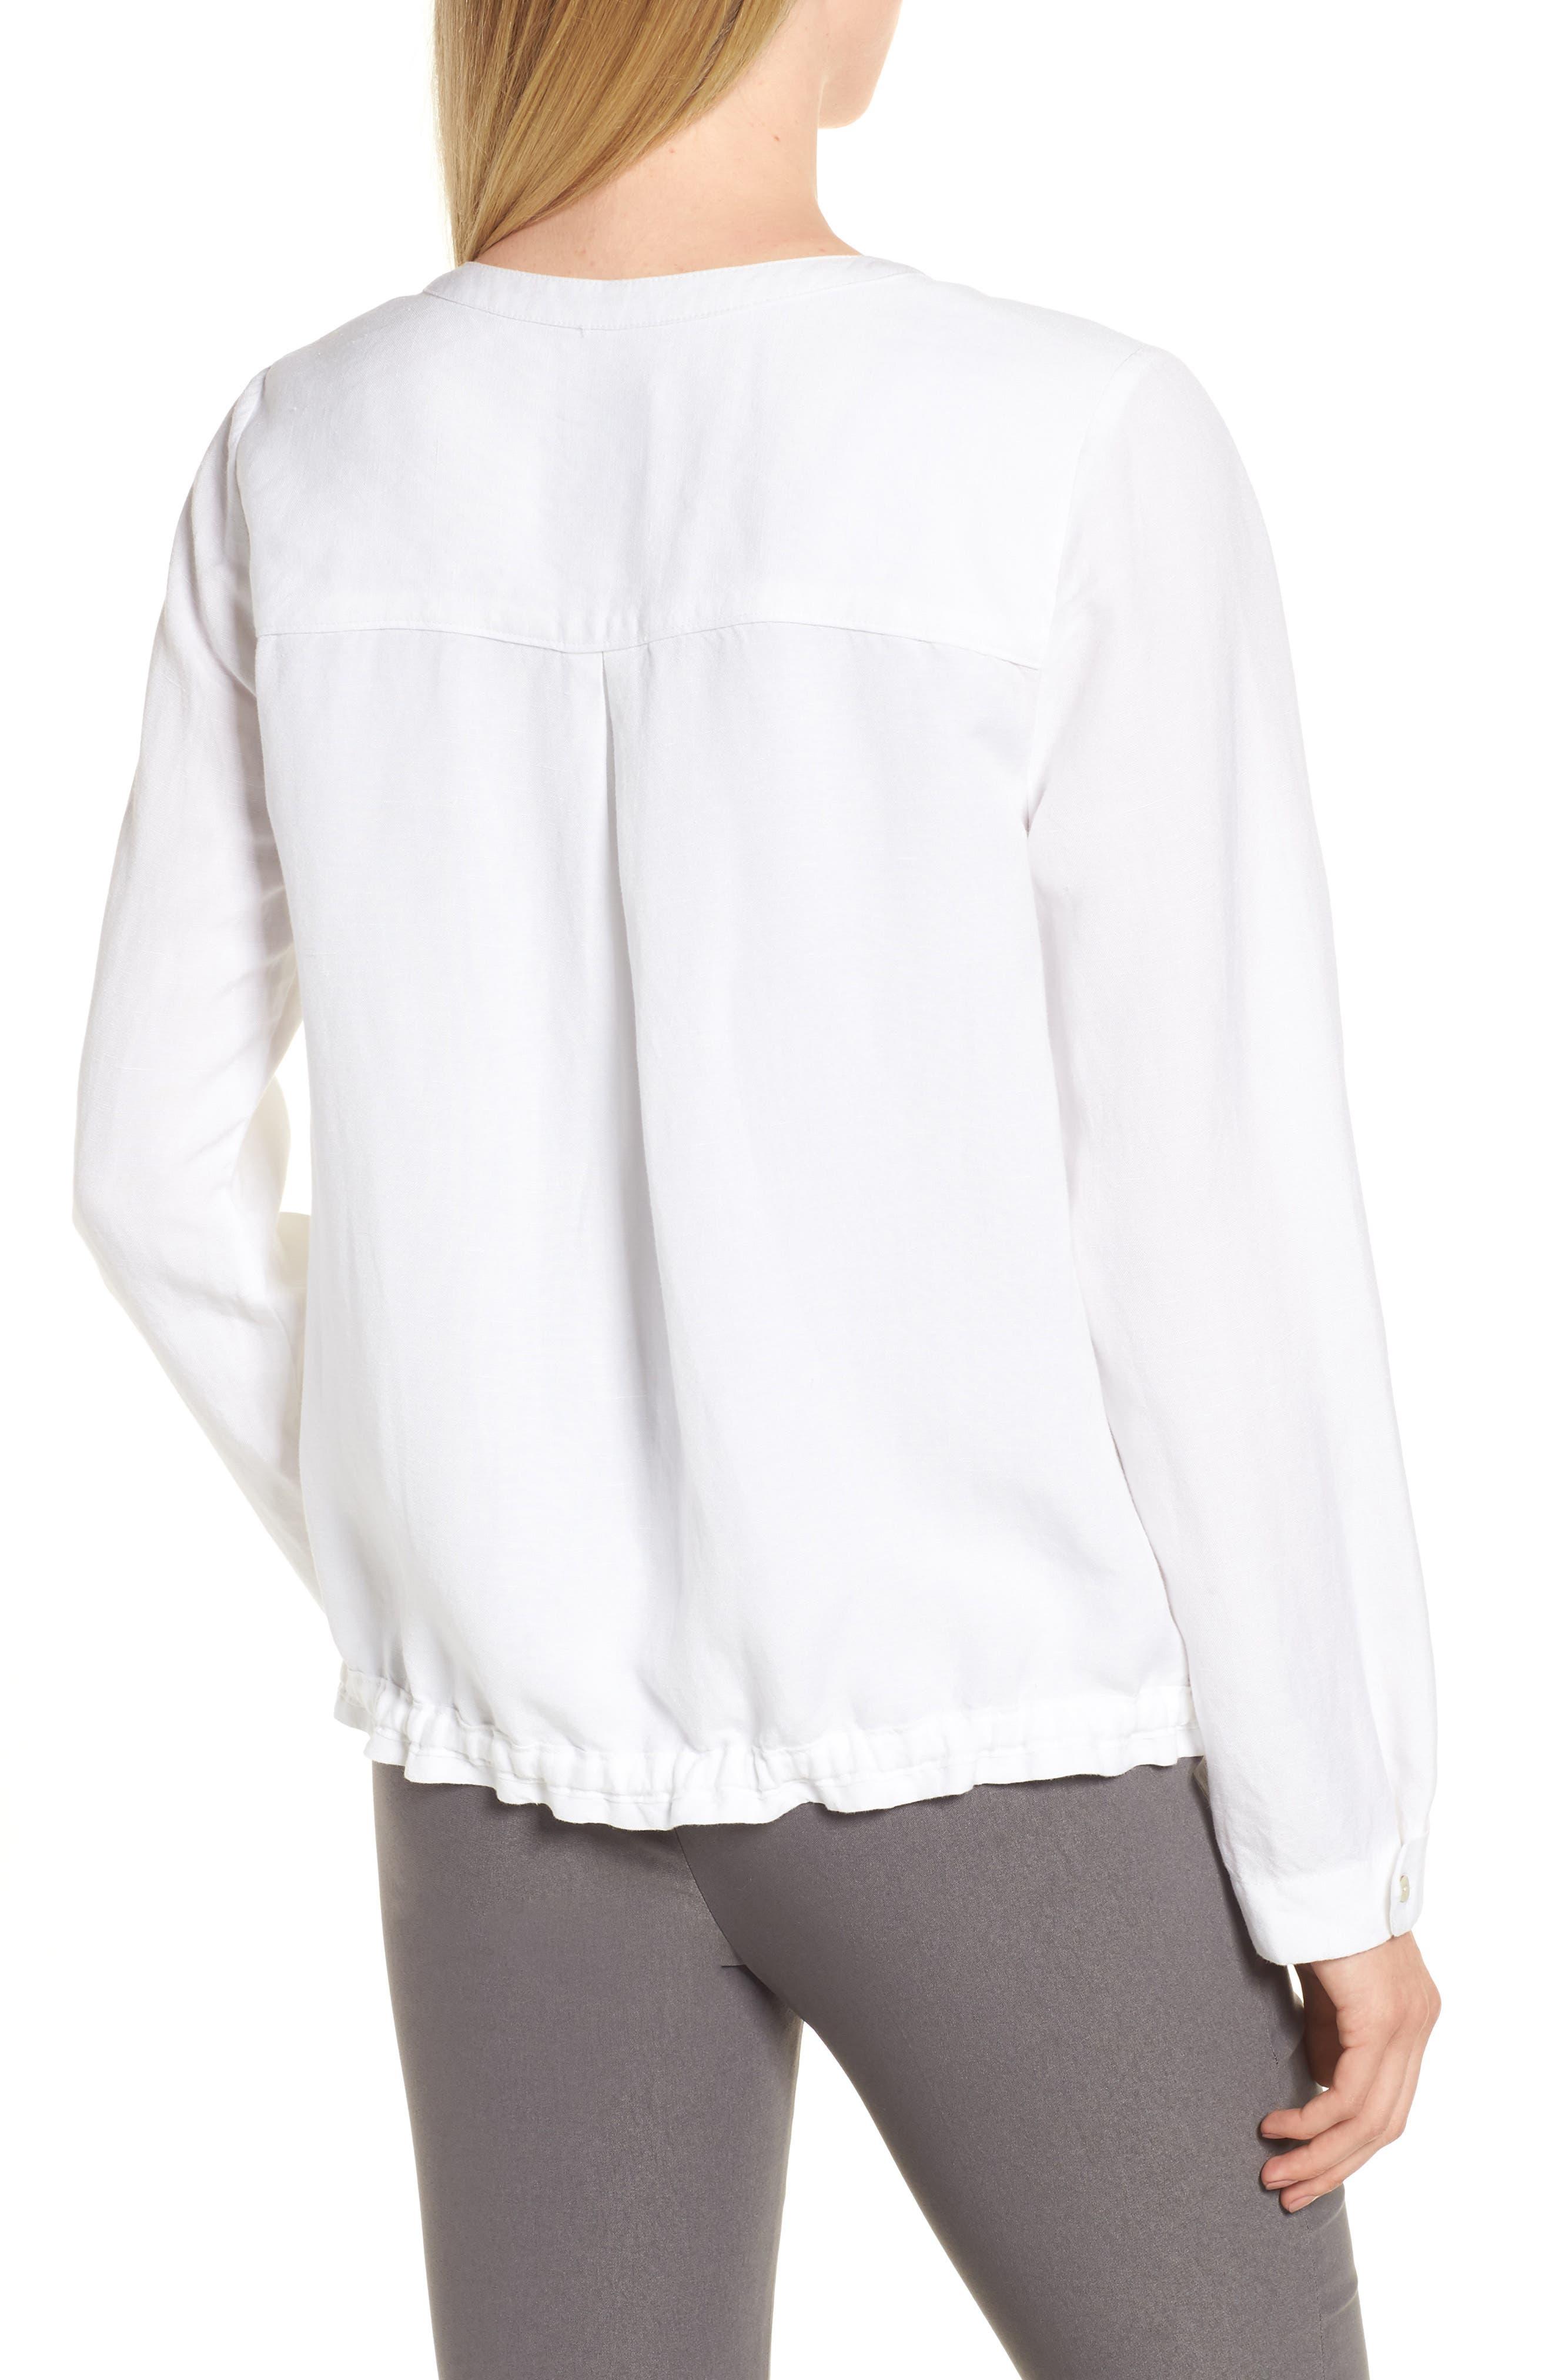 Homebound Linen Blend Drawstring Jacket,                             Alternate thumbnail 2, color,                             123